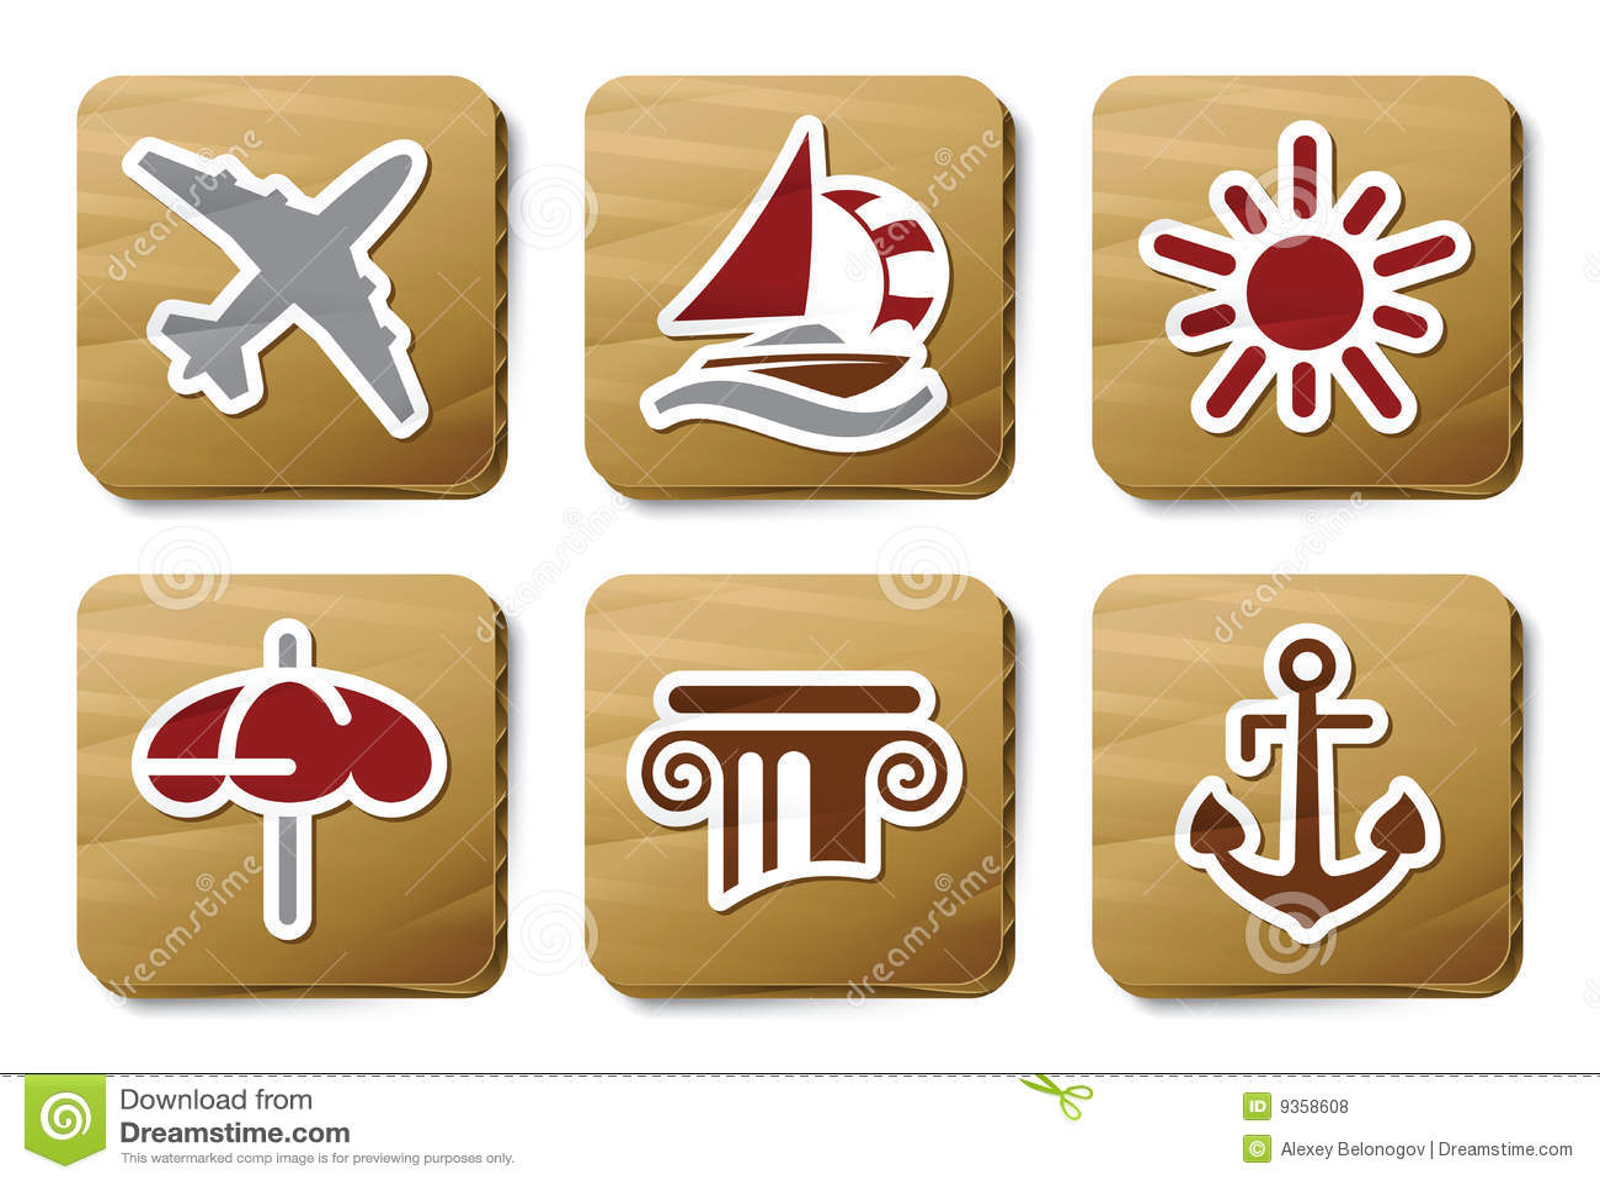 Room service icons | Cardboard series